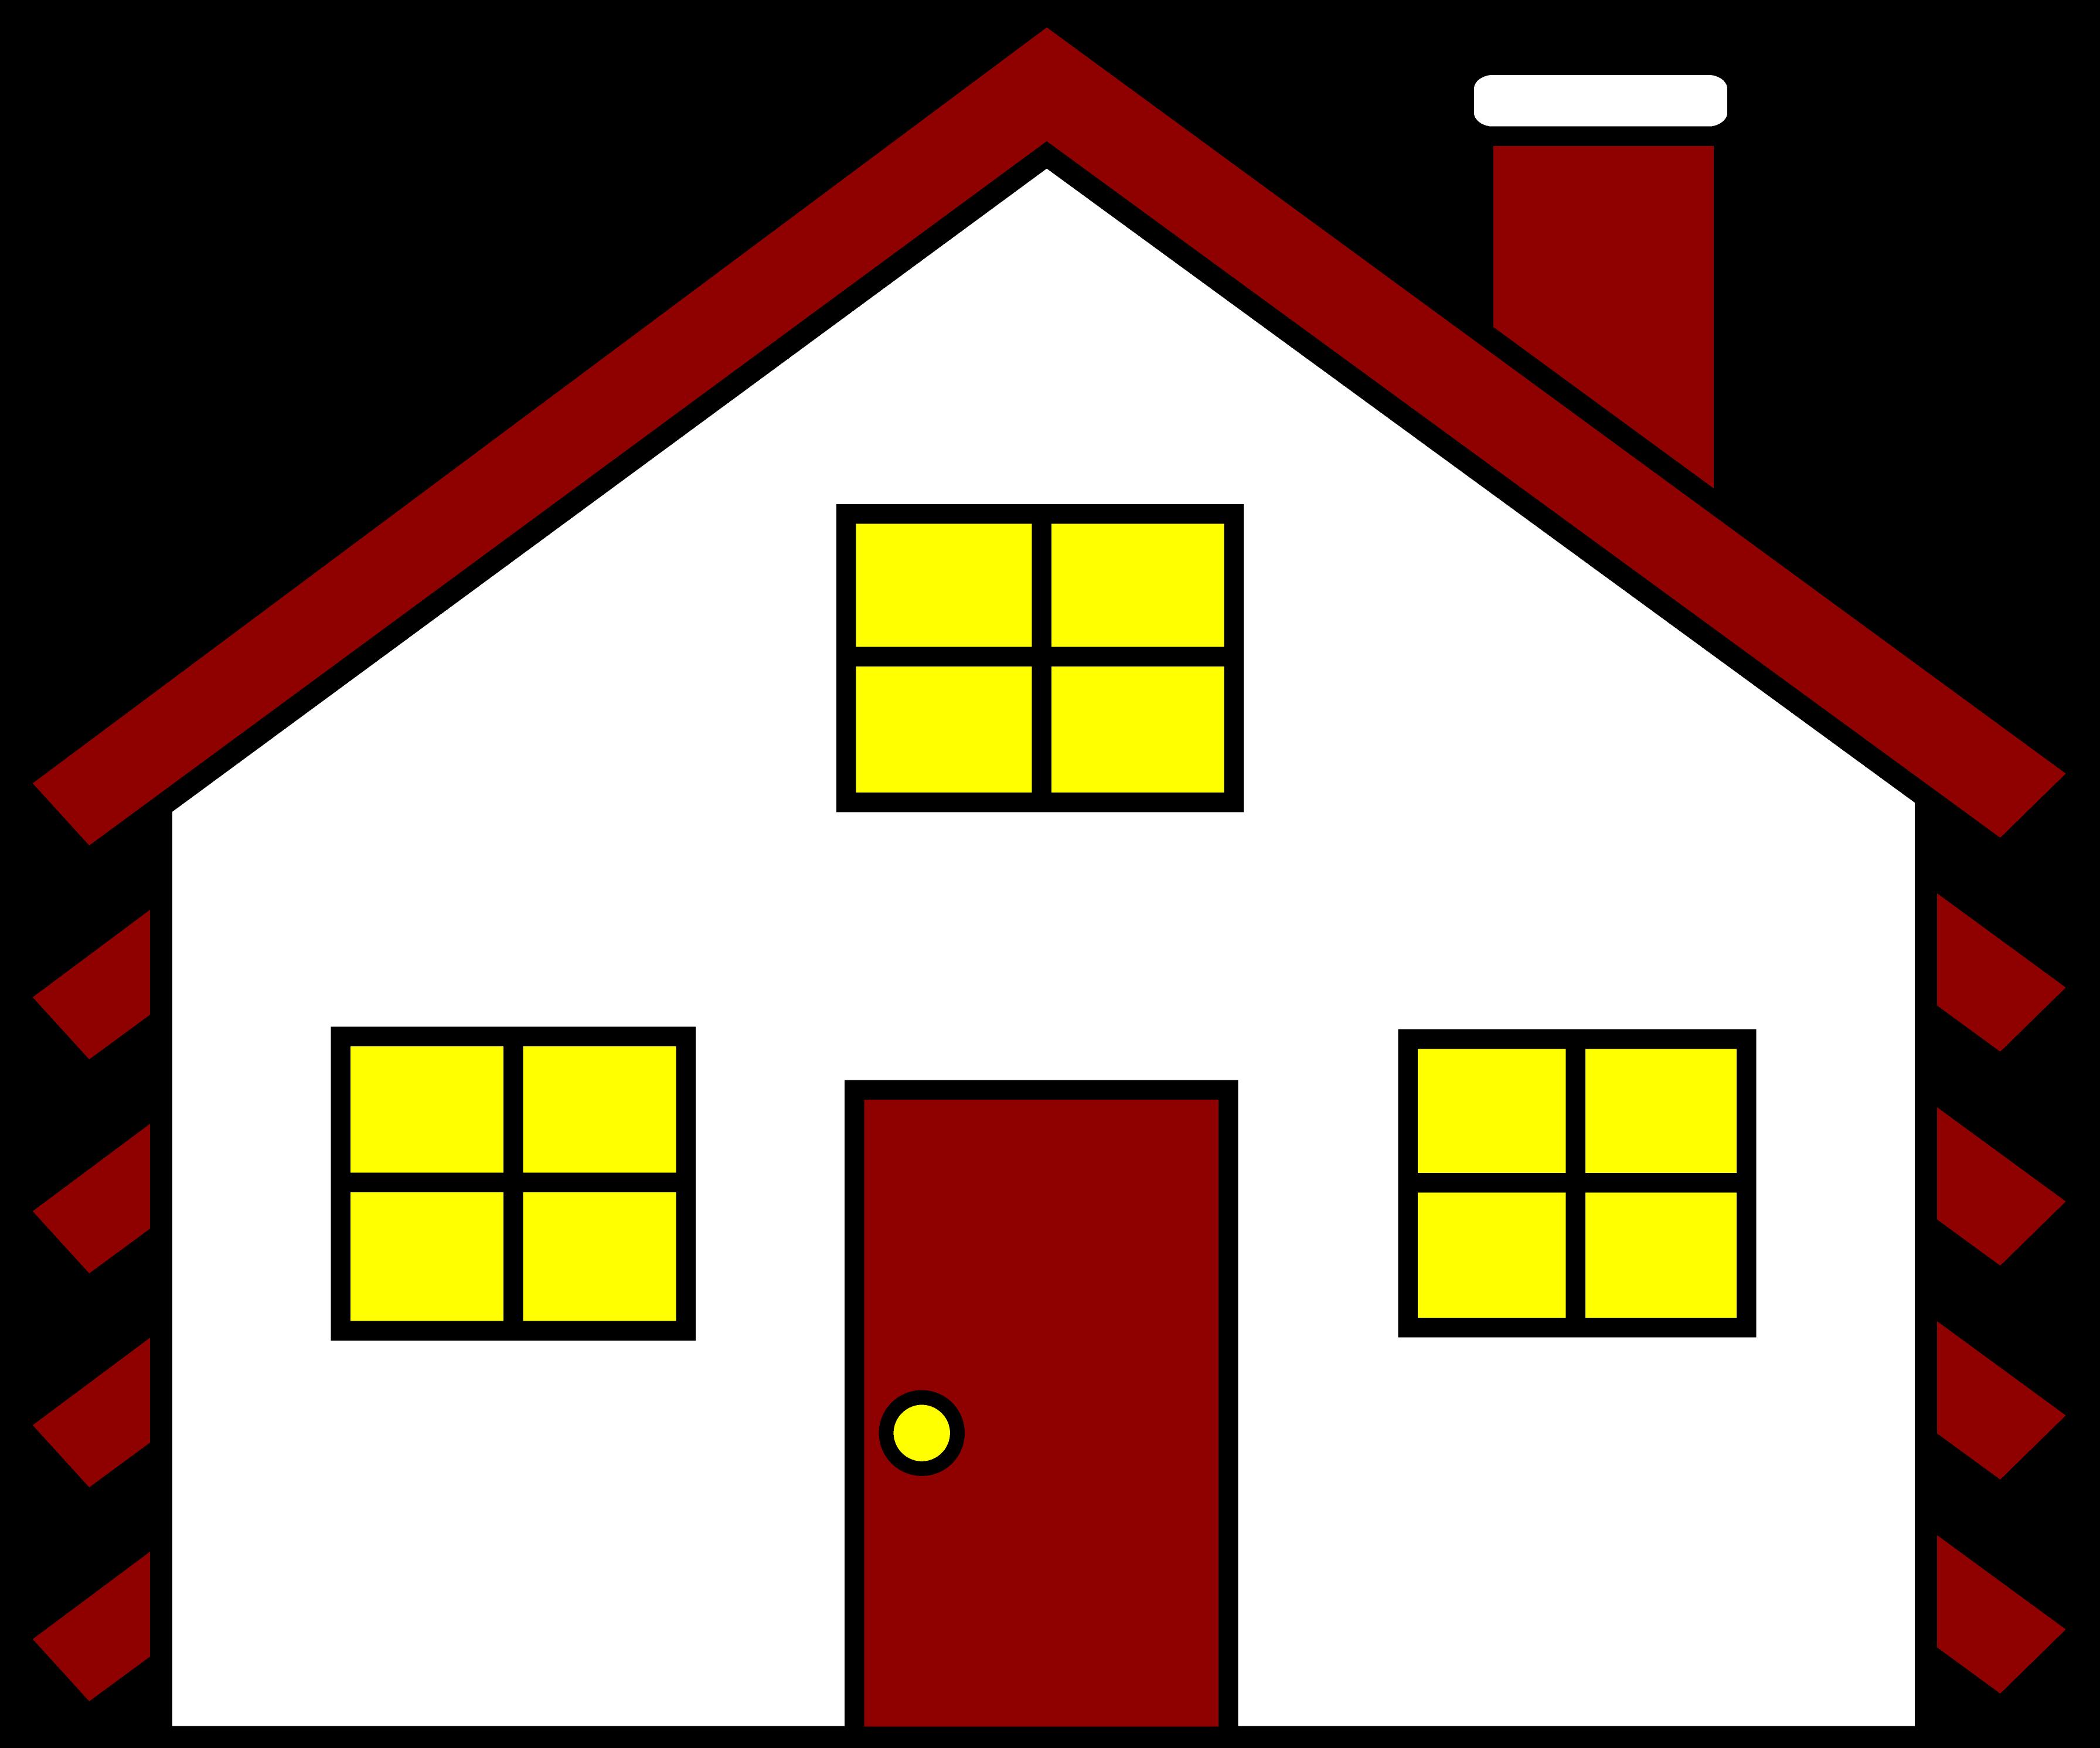 clipart house-clipart house-0